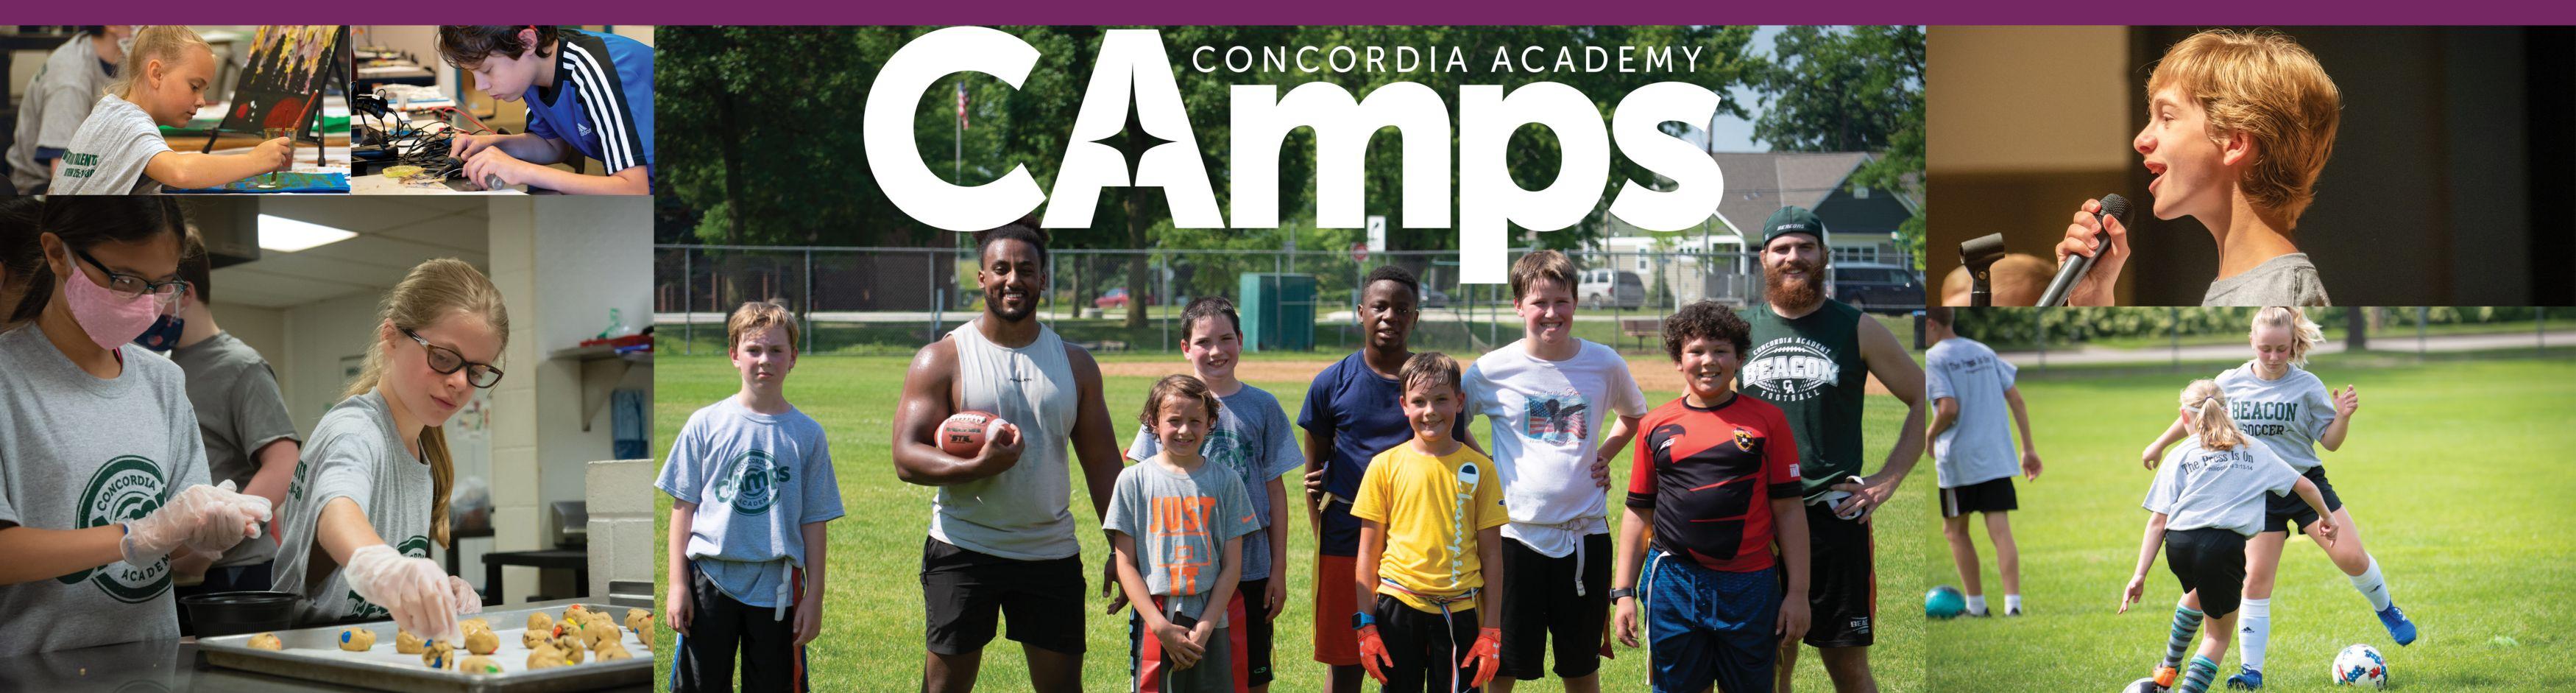 CA Camps Banner